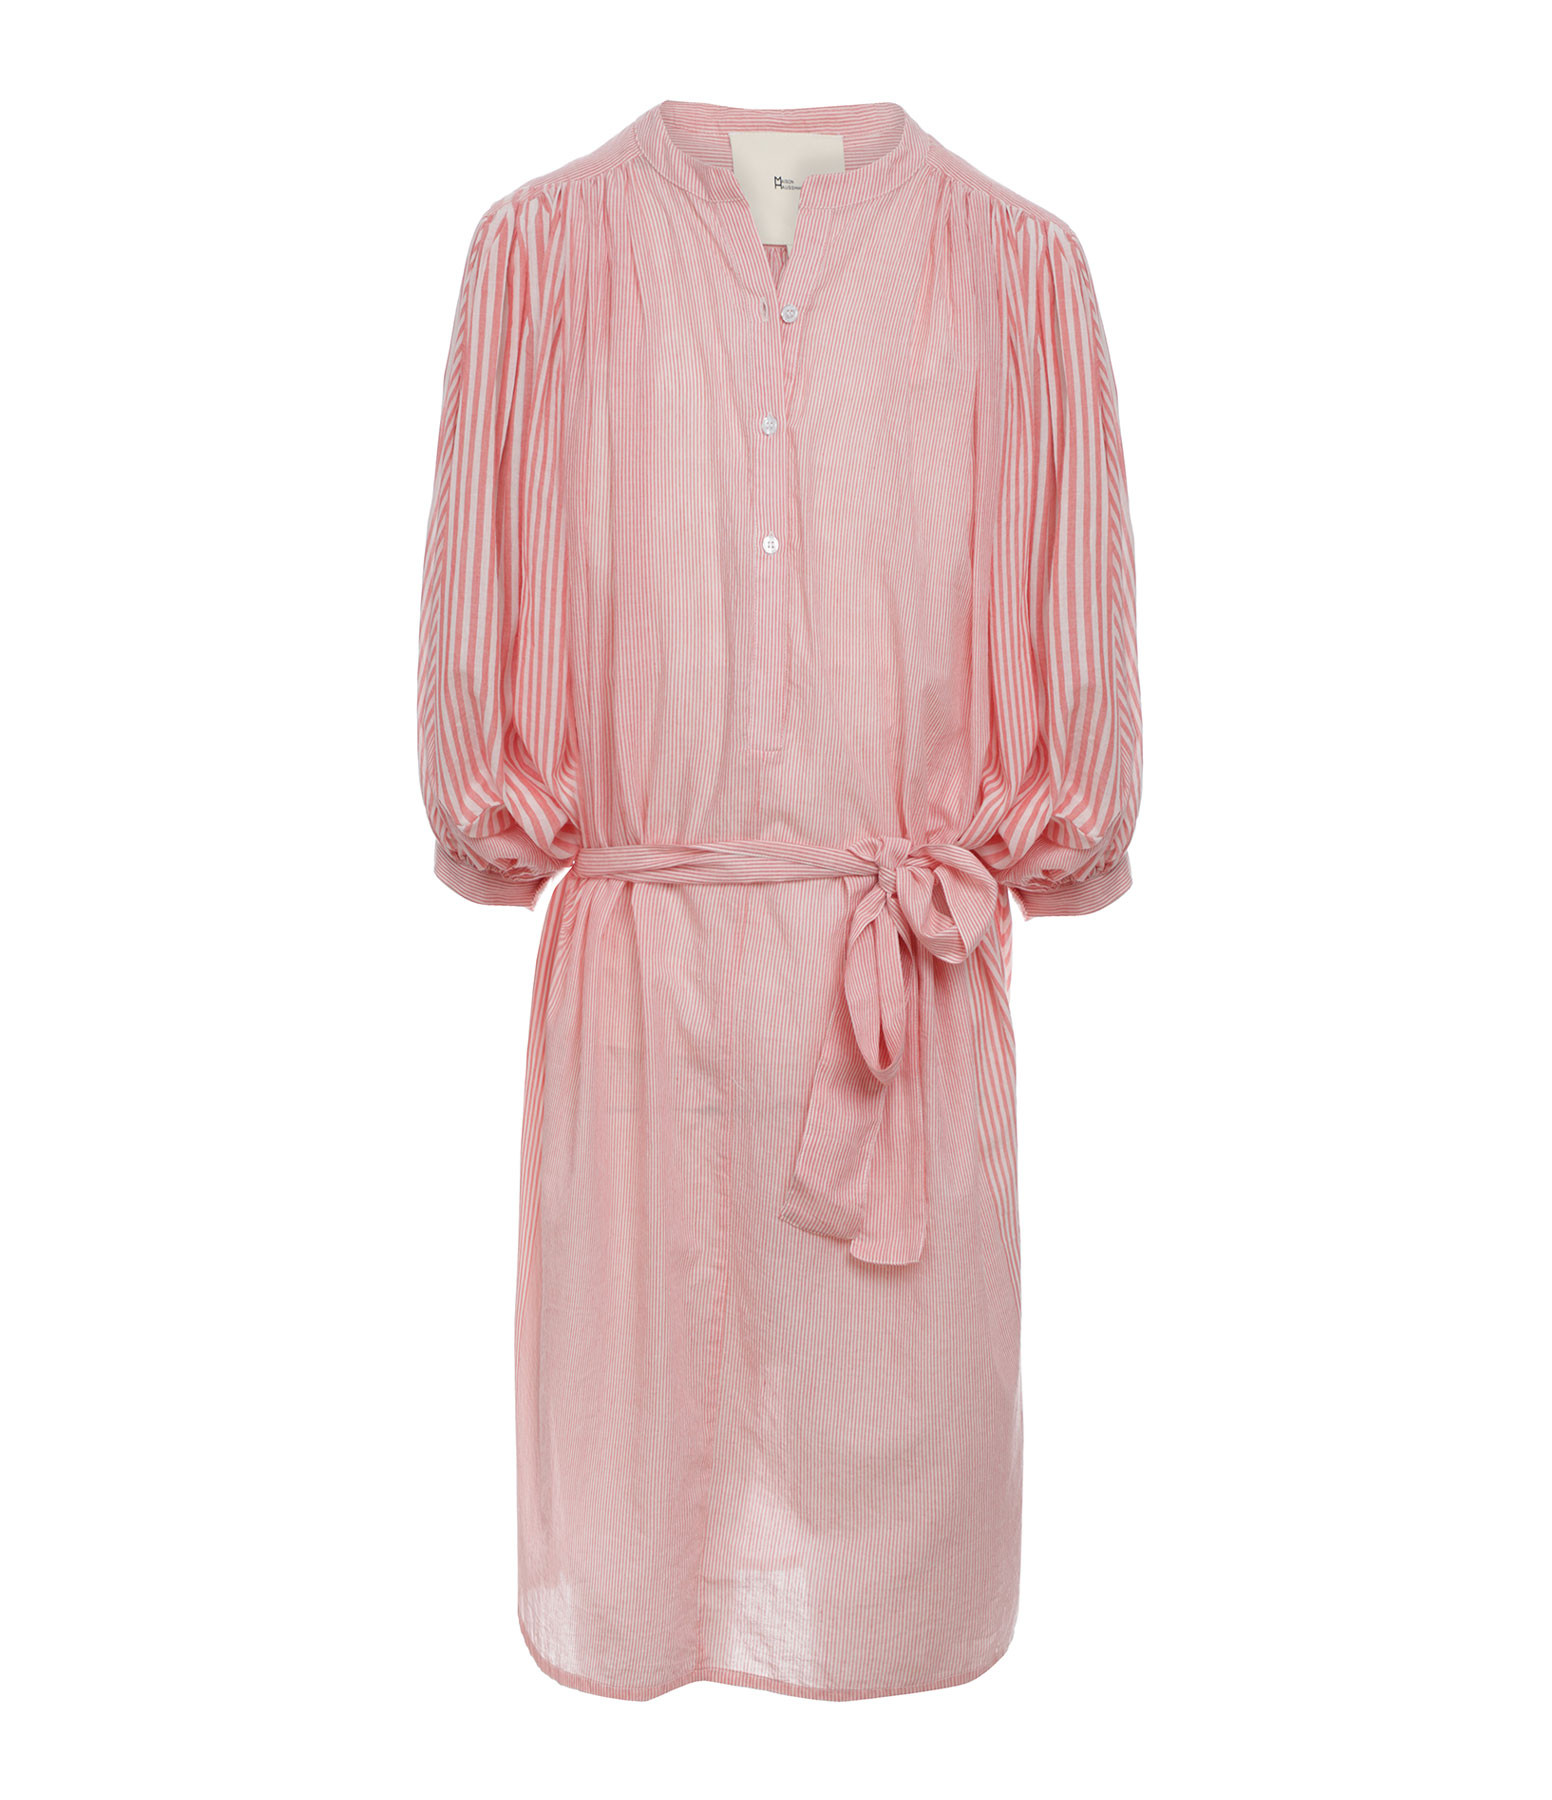 MAISON HAUSSMANN - Robe Coton Rayures Corail